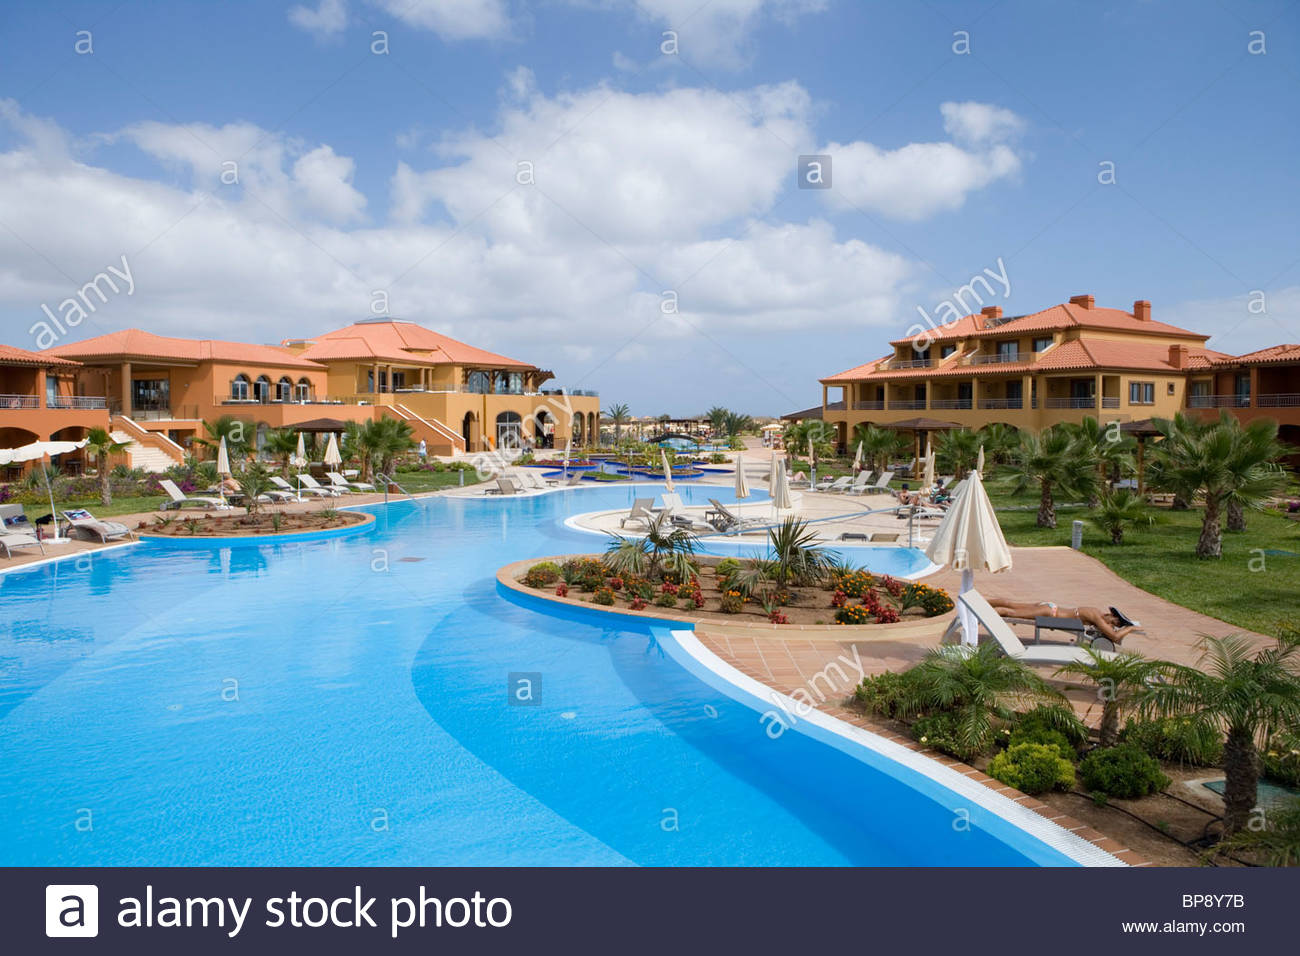 Swimming pool at Pestana Porto Santo Beach Hotel, Porto Santo, near Madeira, Portugal - Stock Image